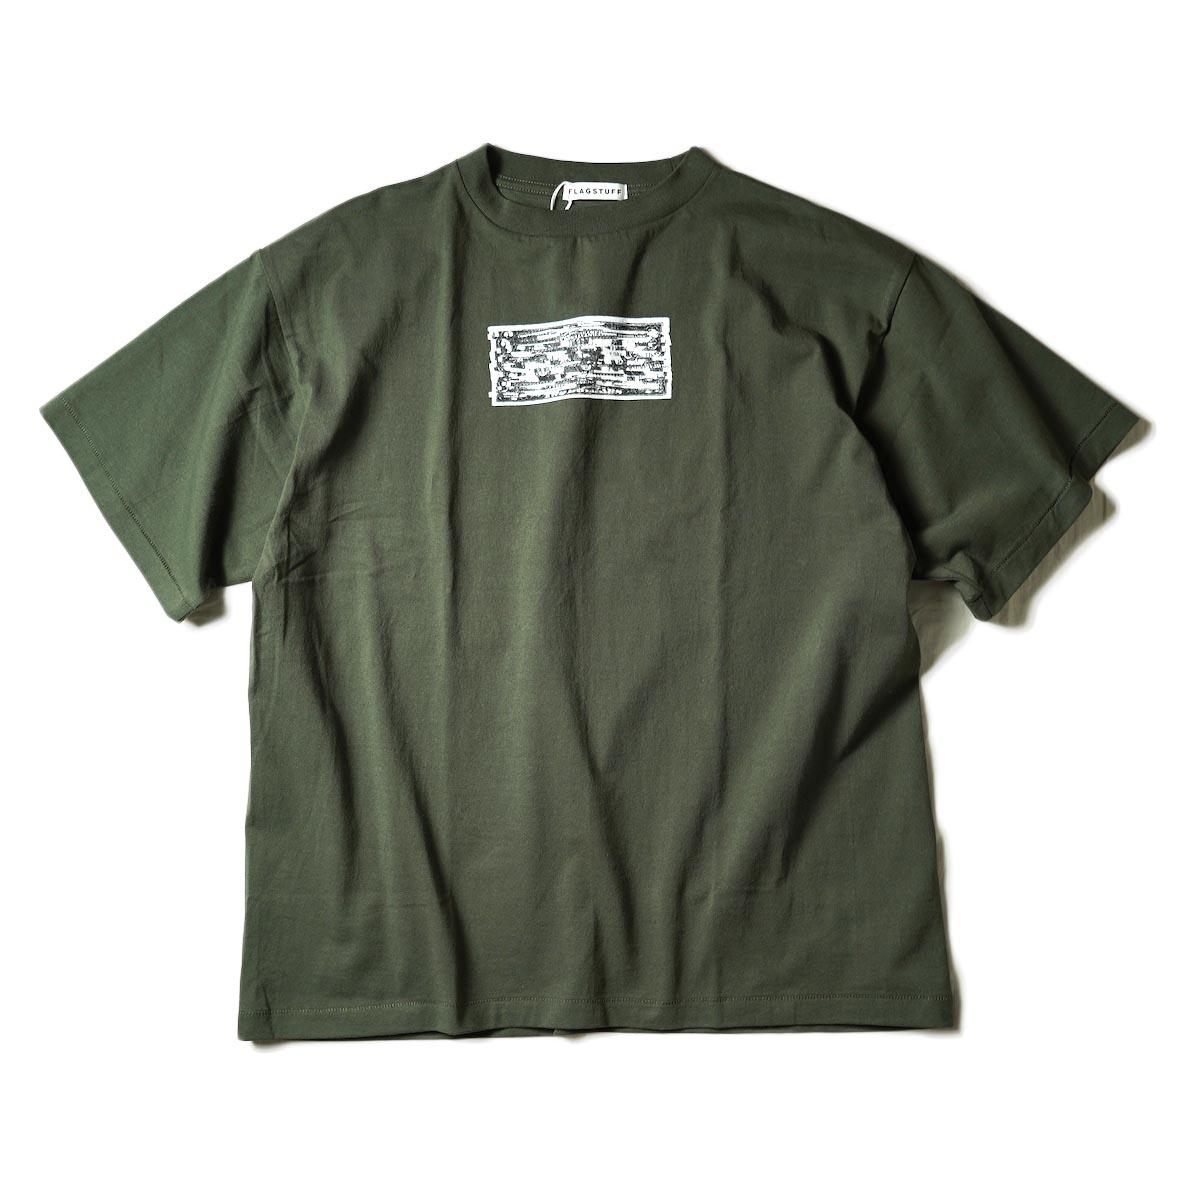 "F-LAGSTUF-F / ""TWO DOLLARS"" S/S Tee (Green)"